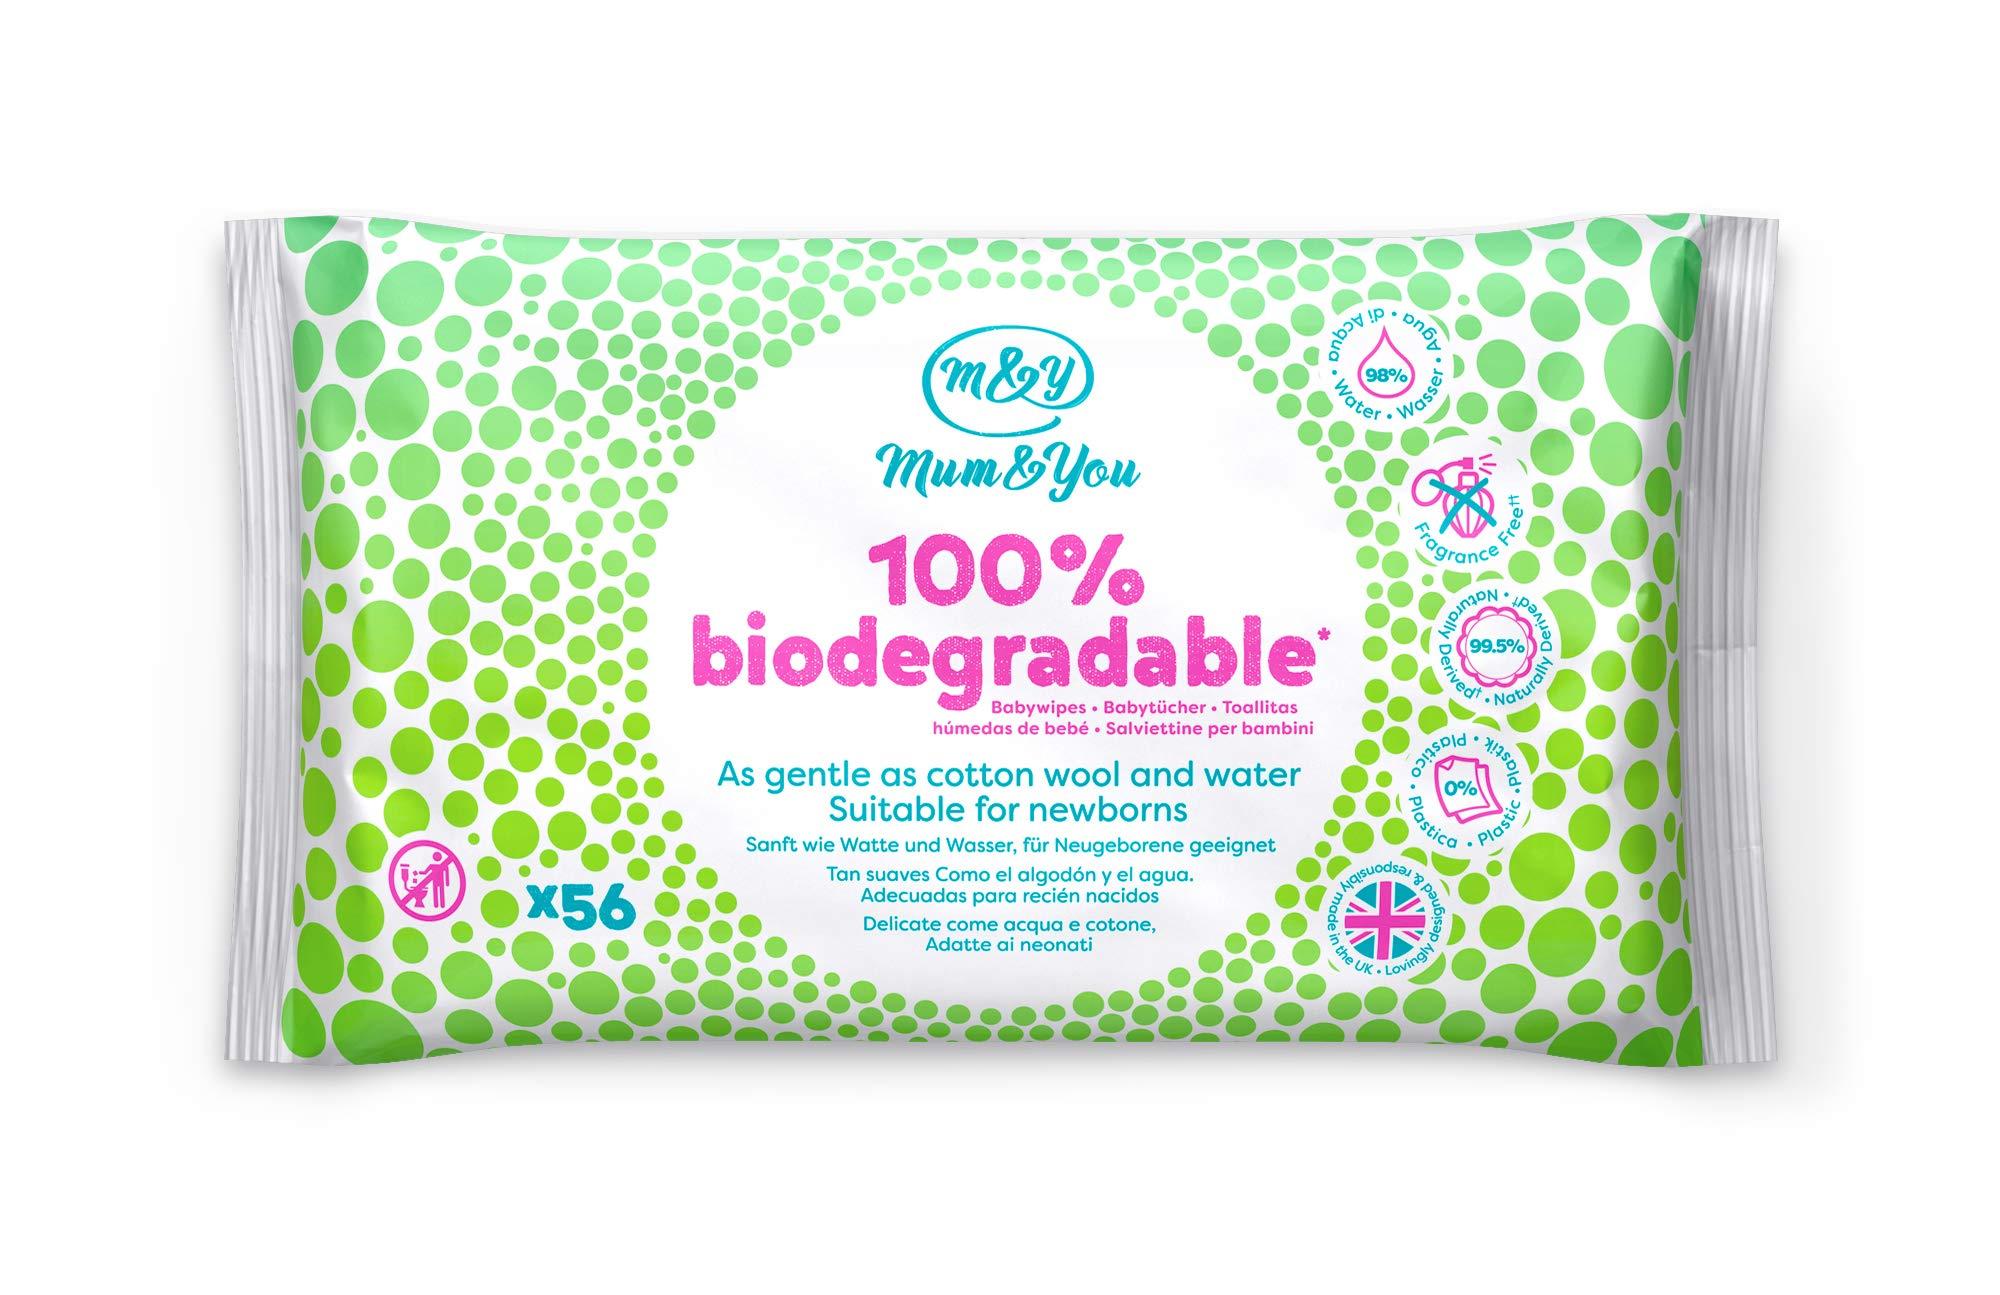 Paquetes Para Bebes Recien Nacidos.Mum You Toallitas Humedas Para Bebes 100 Biodegradables Paquete De 12 672 Toallitas En Total 98 De Agua 0 De Plastico Hipoalergenico Y